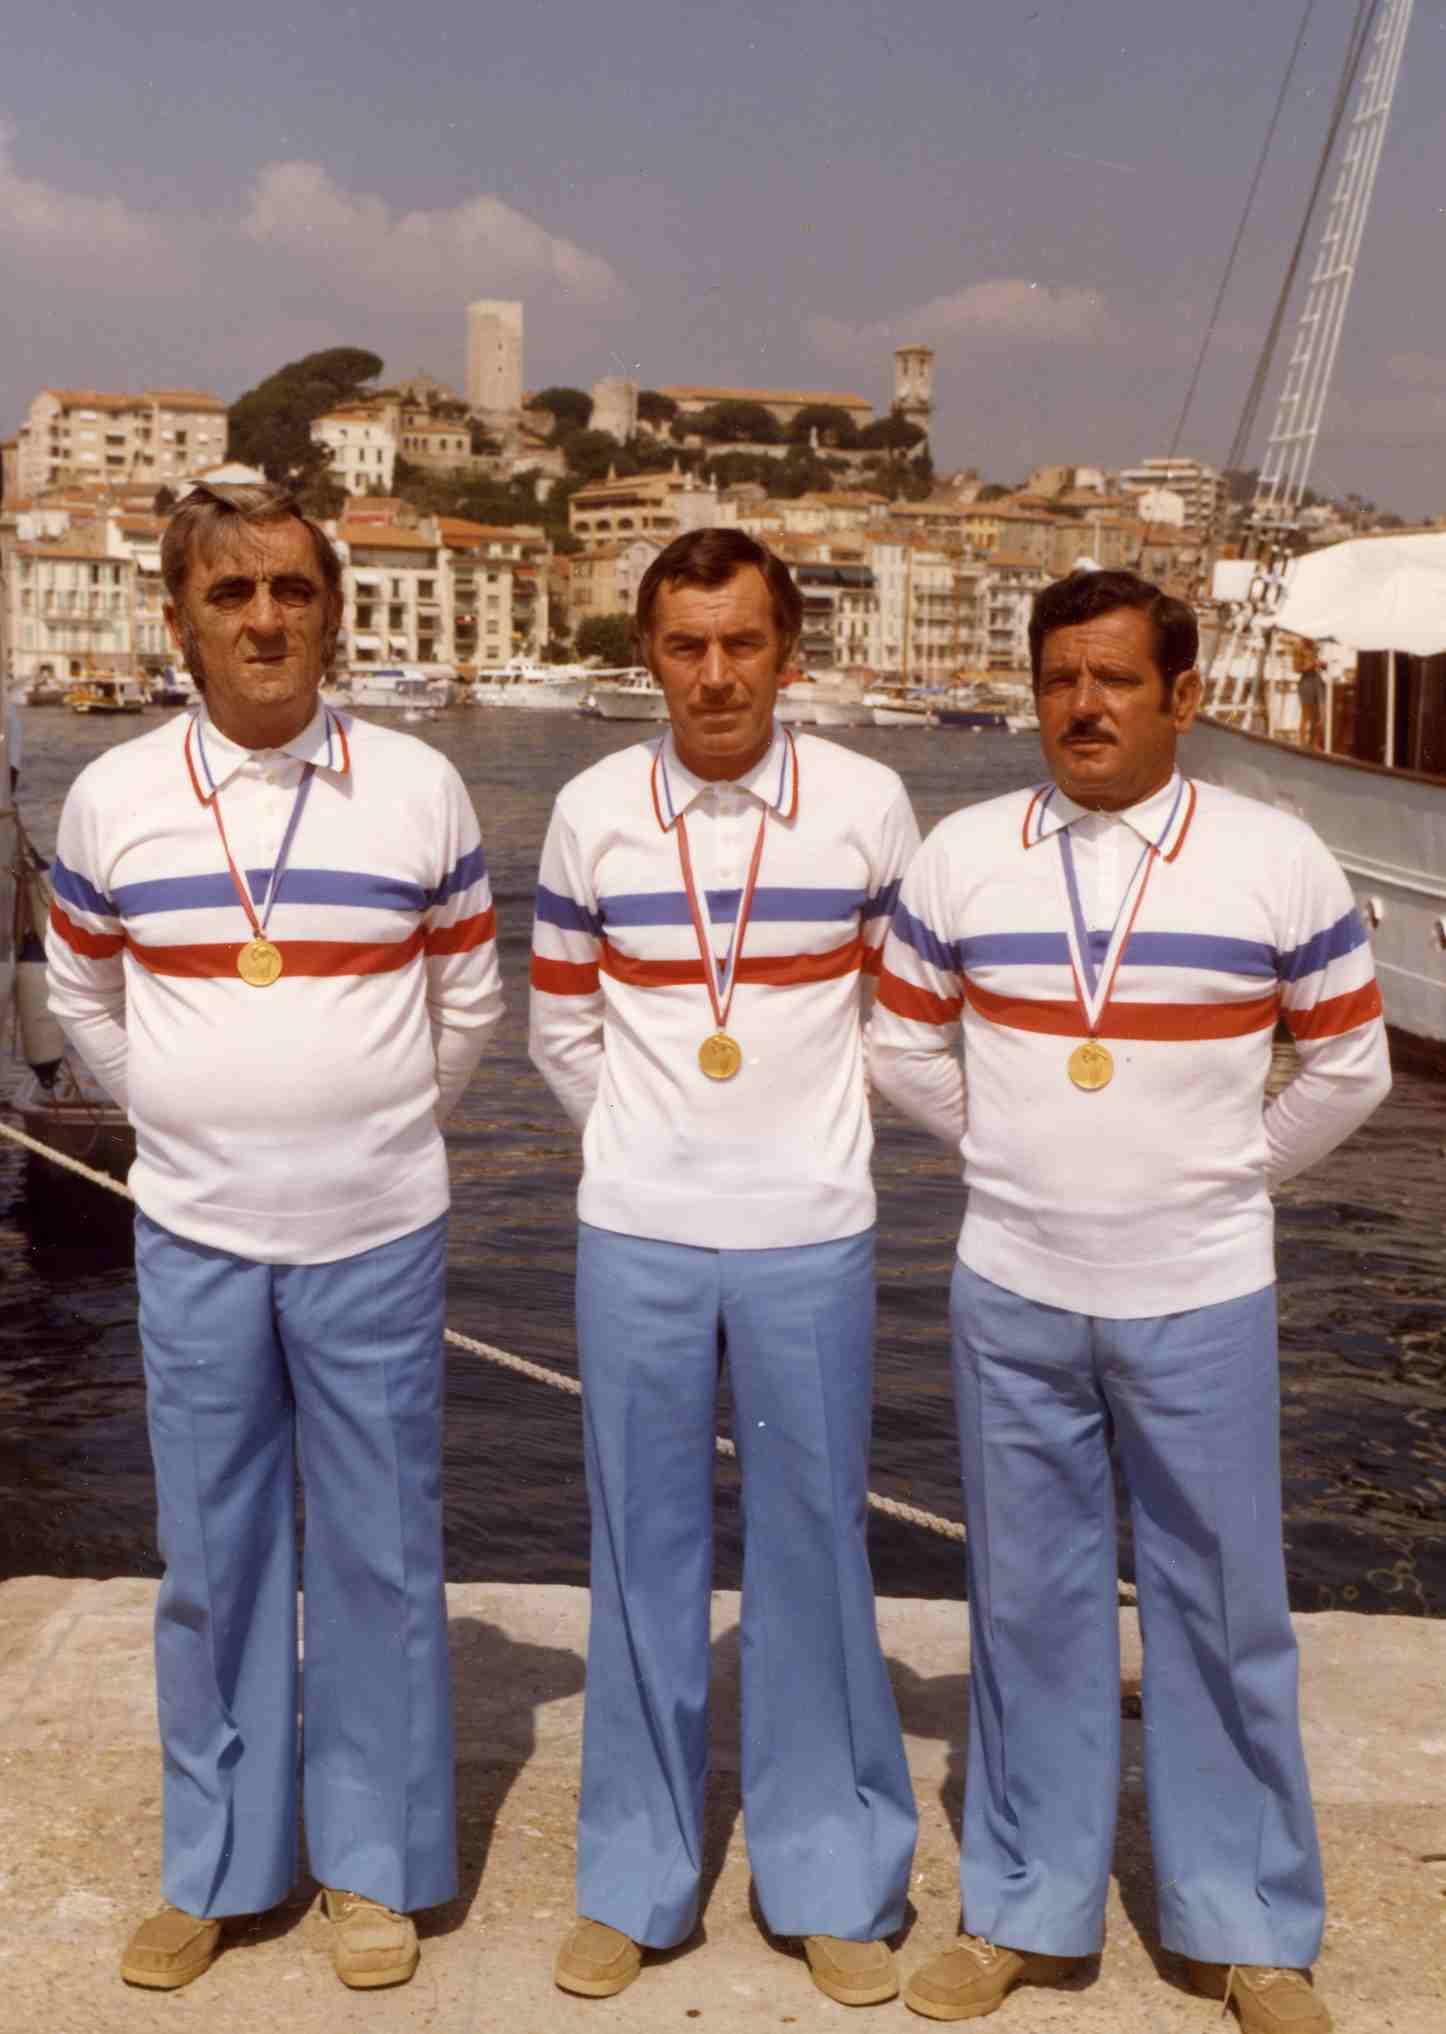 Les champions de France triplettes 1976 > Elio TINI - Raymond FRESCURA - Ange ARCOLAO